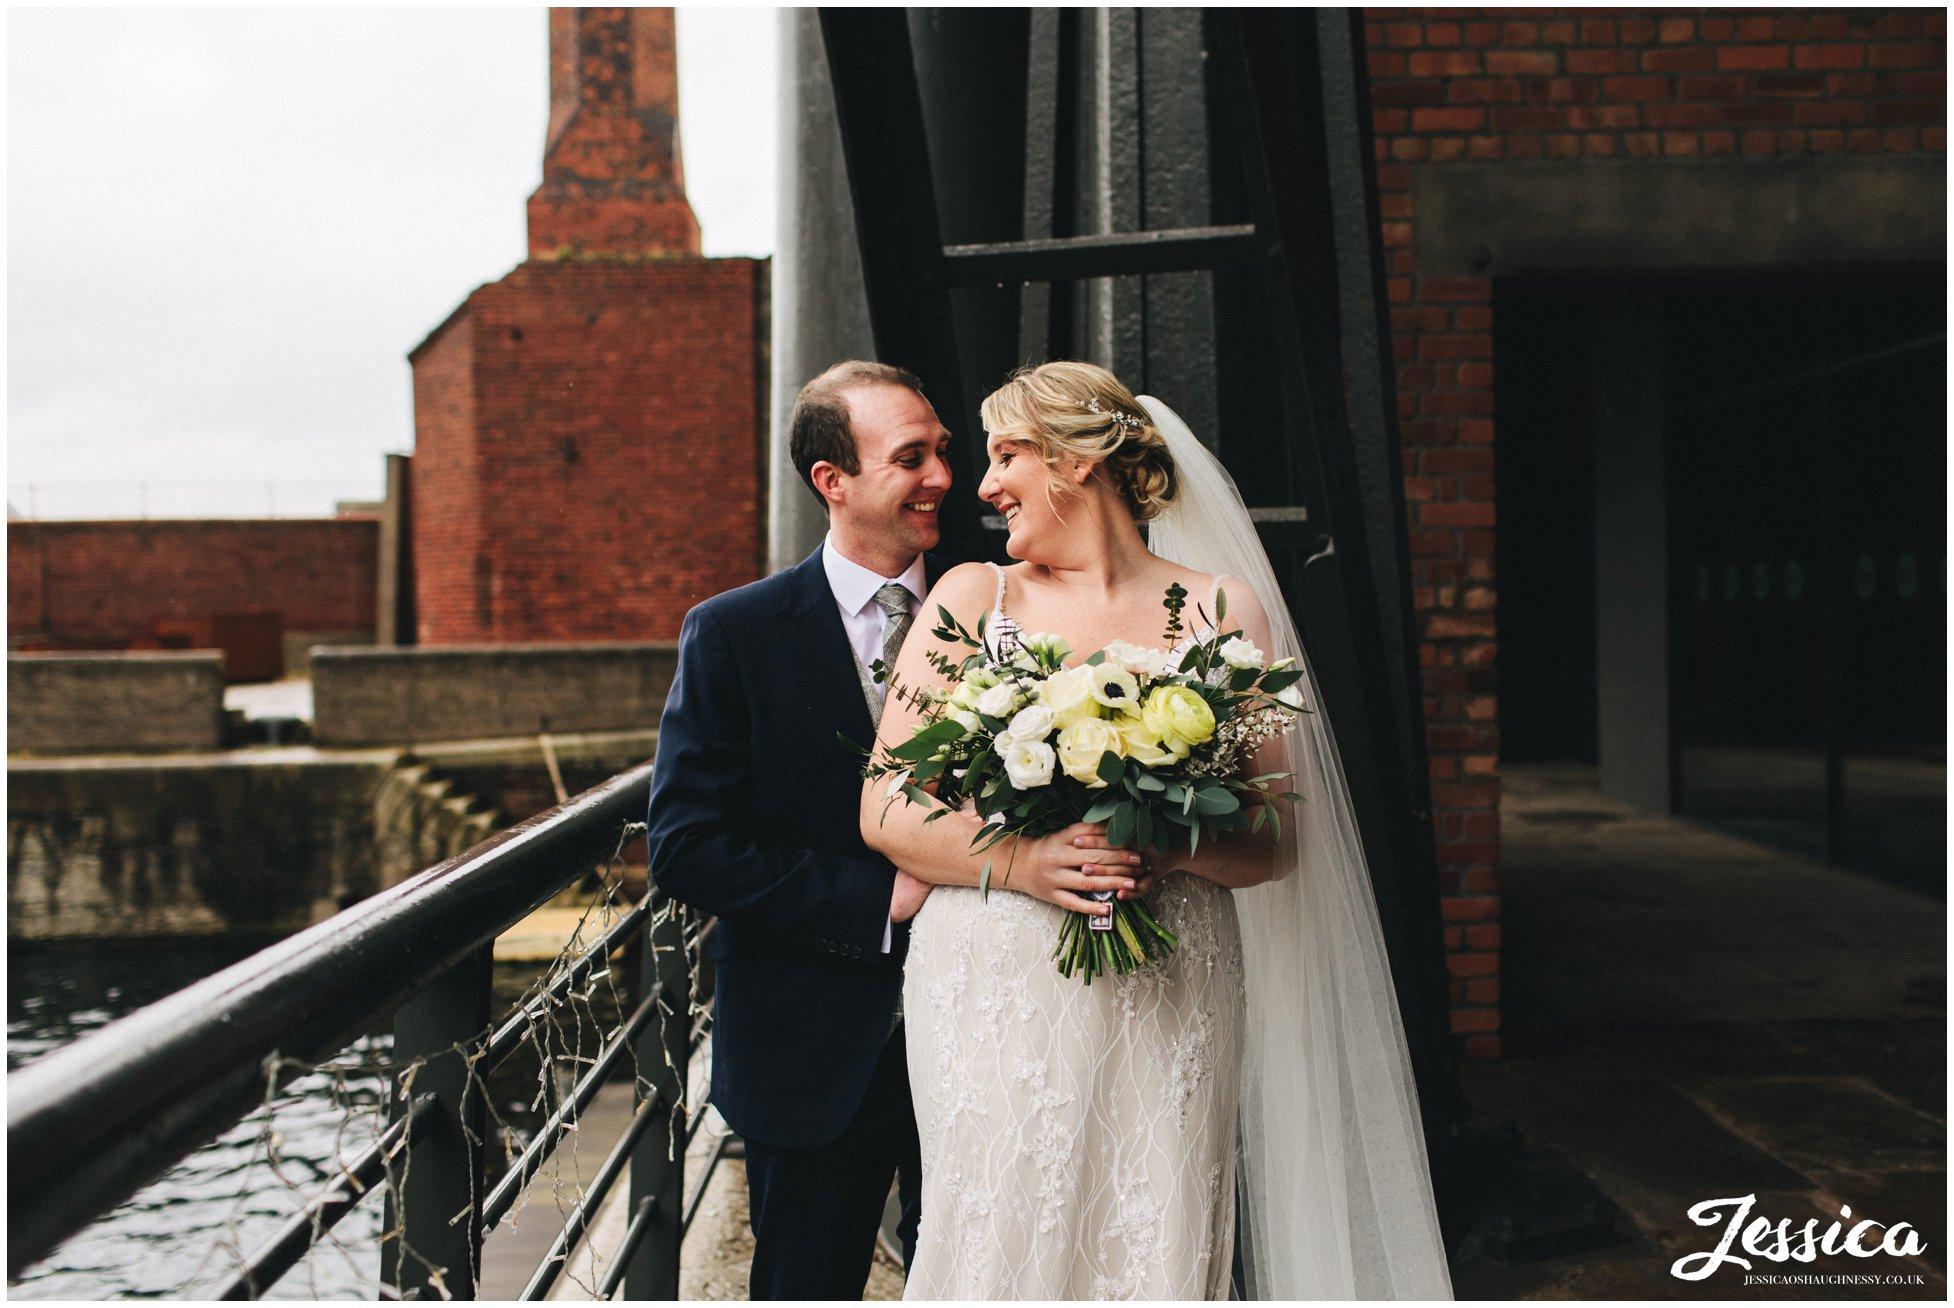 the bride & groom embrace along side liverpool docks